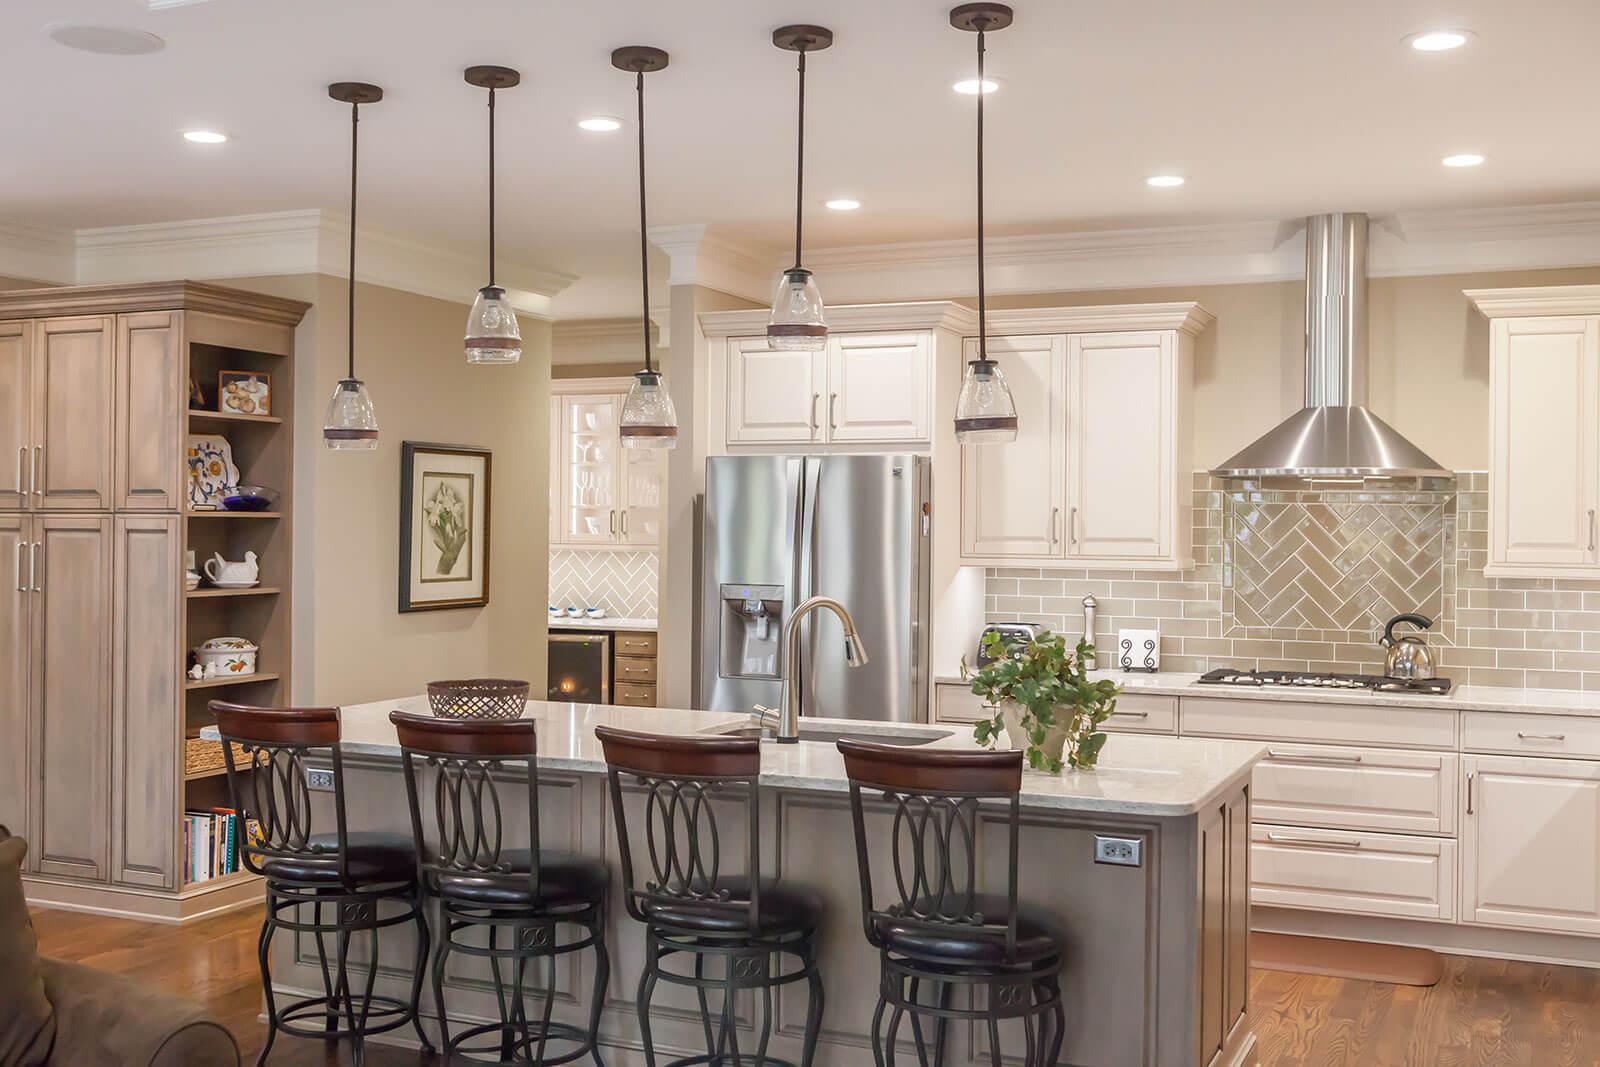 Traditional Kitchen - Cheryl Pett Design on Traditional Kitchen Decor  id=43510